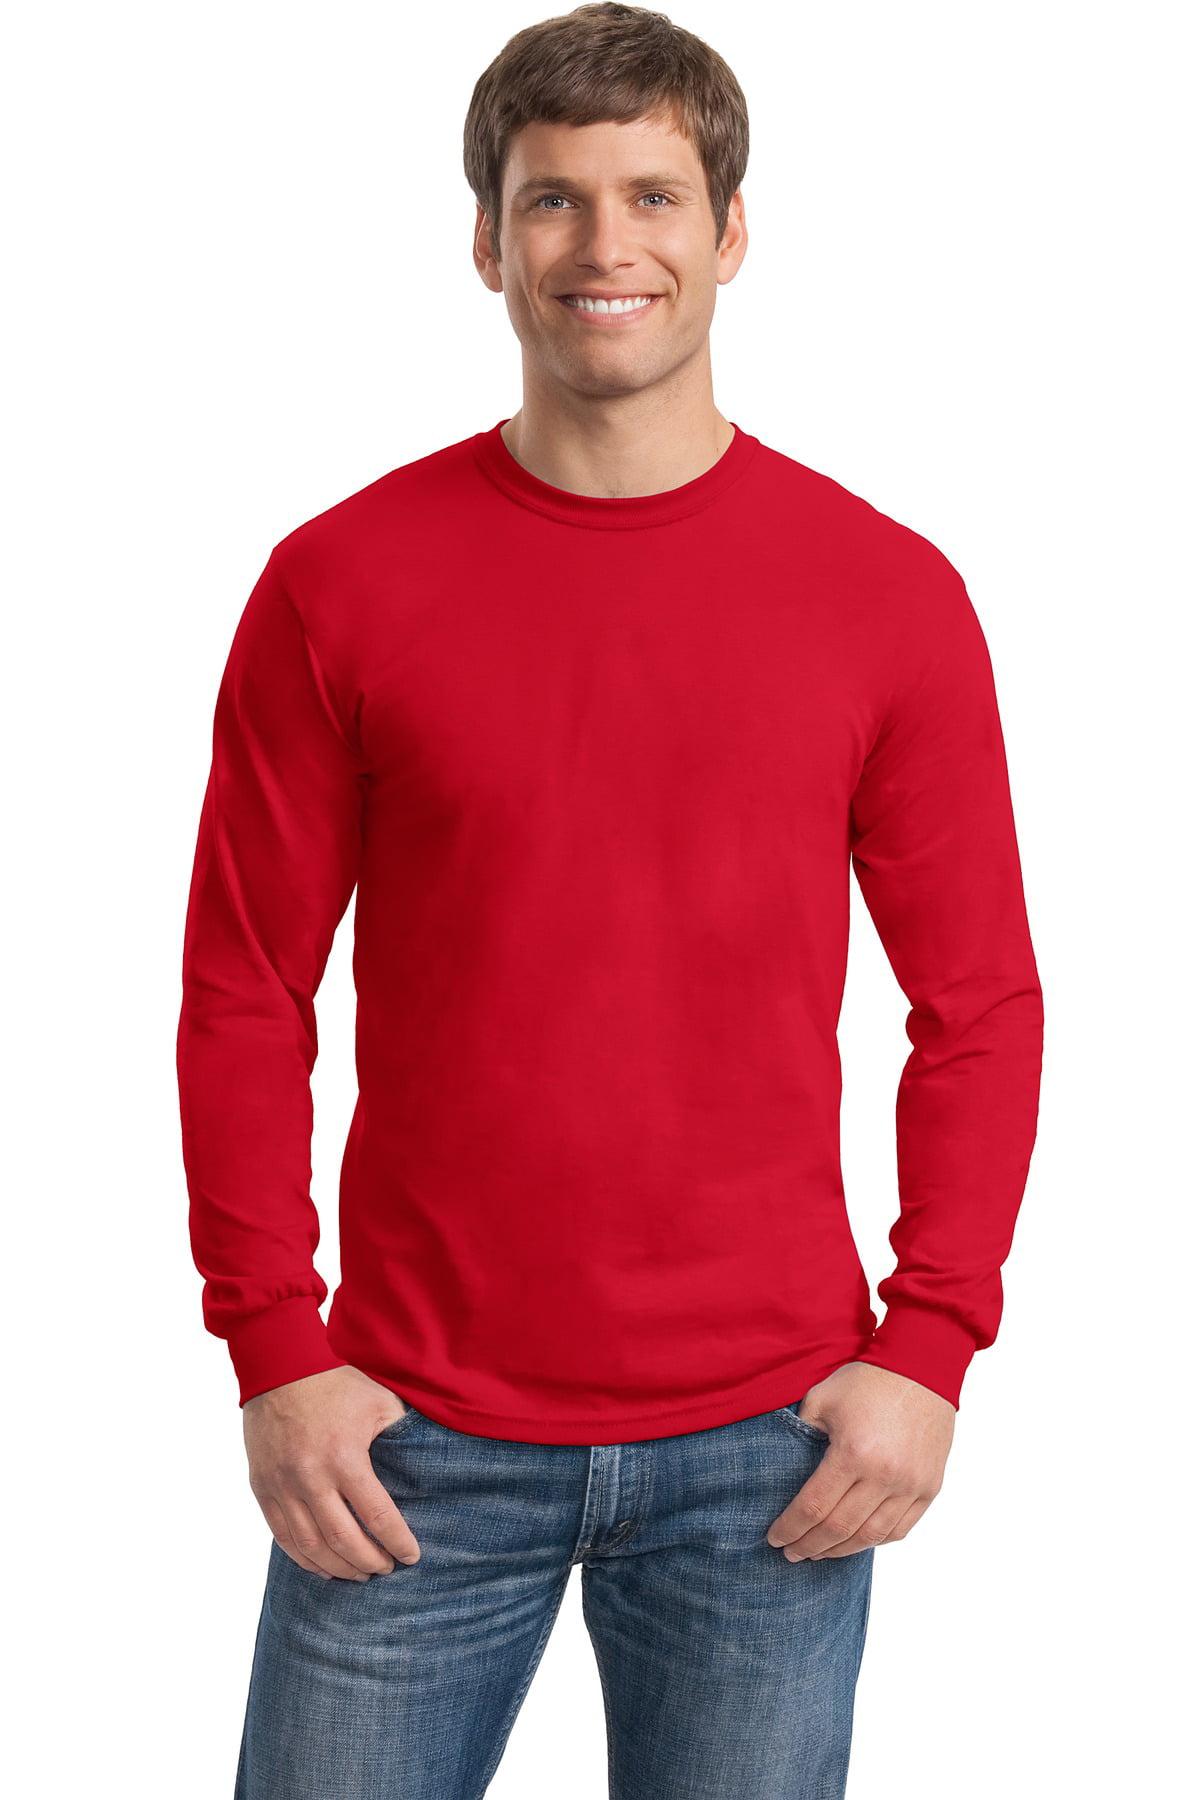 b56ccd1f026 Gildan - Gildan Men s Short Sleeve Heavy Cotton 100% Cotton Long Sleeve T- Shirt - 5400 - Walmart.com